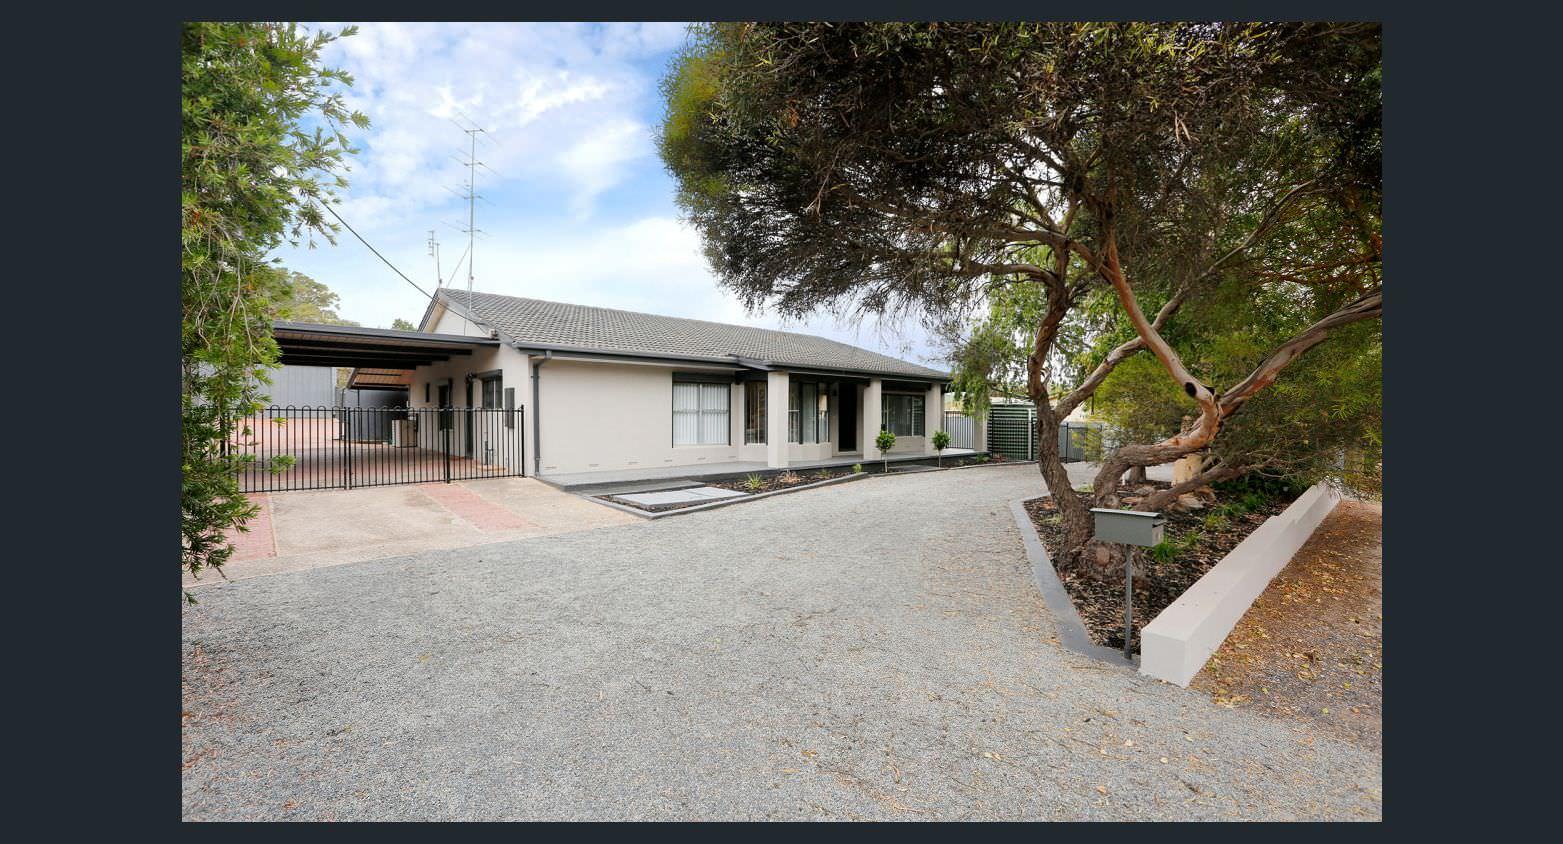 Penrice Road, Penrice SA